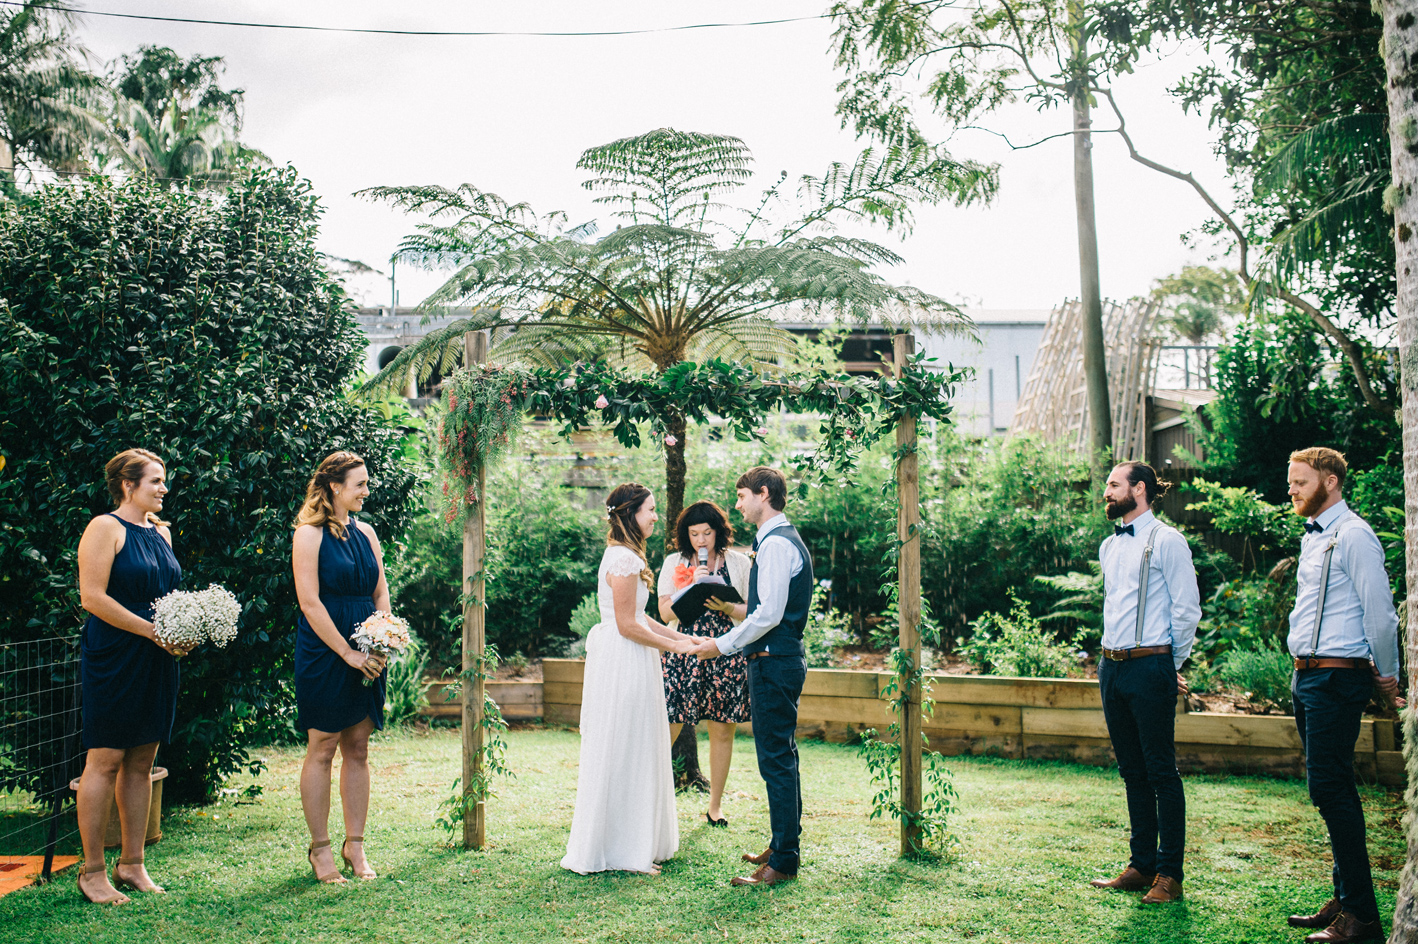 025-michelle-reagan-mount-tamborine-wedding-sophie-baker-photography